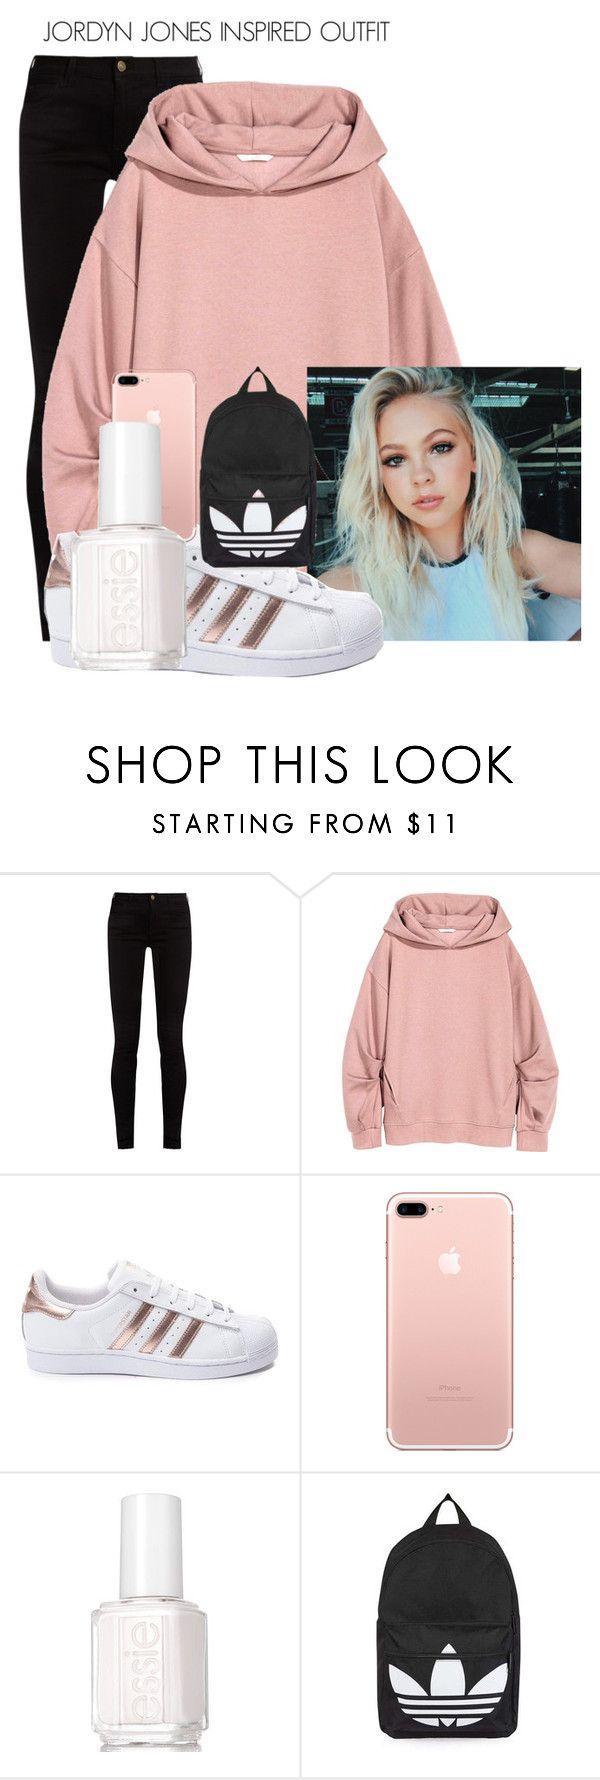 """Jordyn Jones Inspired outfit"" by sydypop ❤ liked on Polyvore featuring Gucci, adidas, Essie, Topshop, Sweatshirt, 2017, jordynjones and Jordyn"